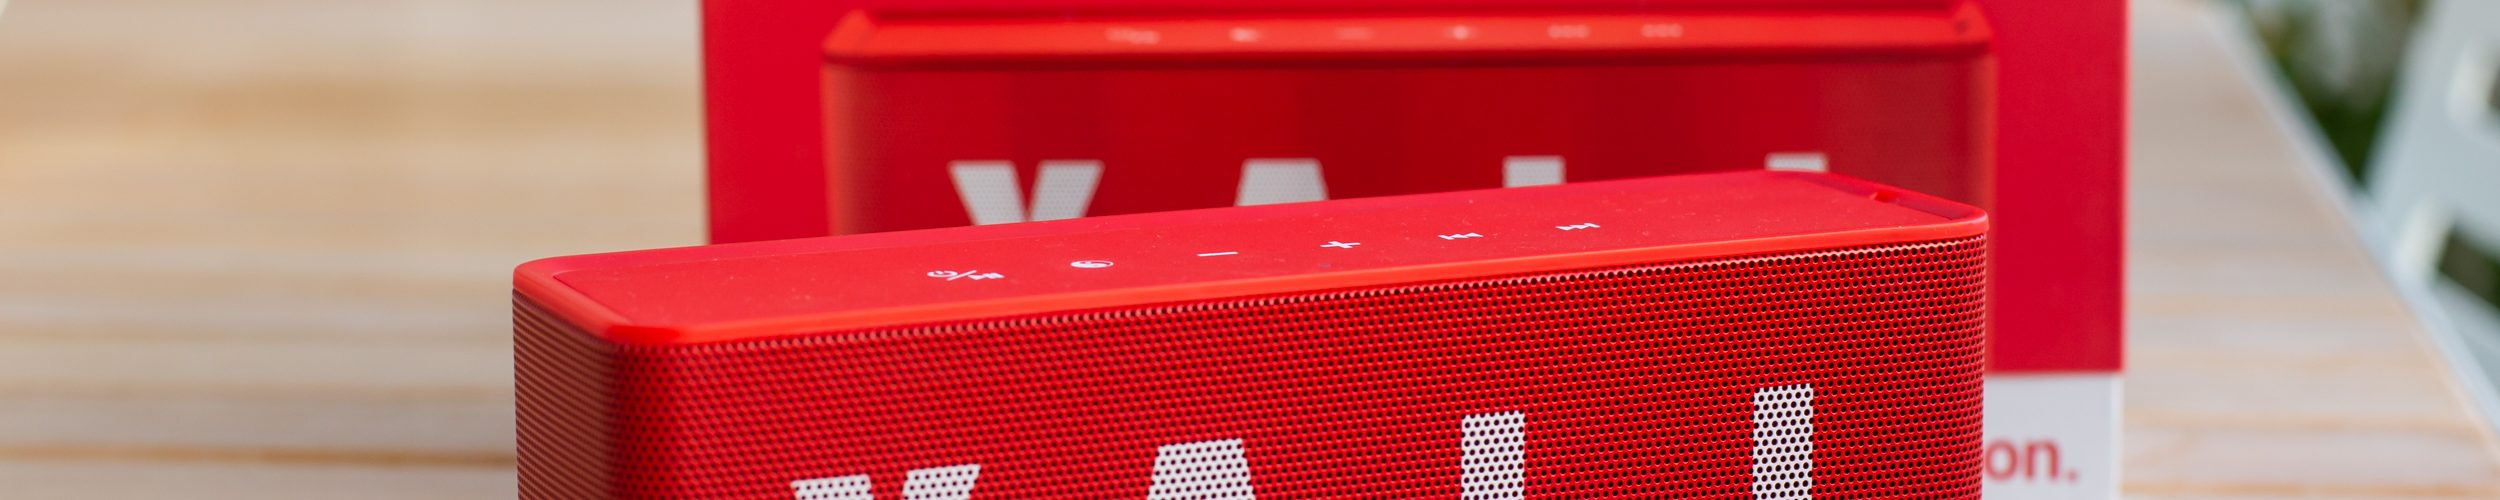 Energy Music Box 5+ análisis MVL Manía